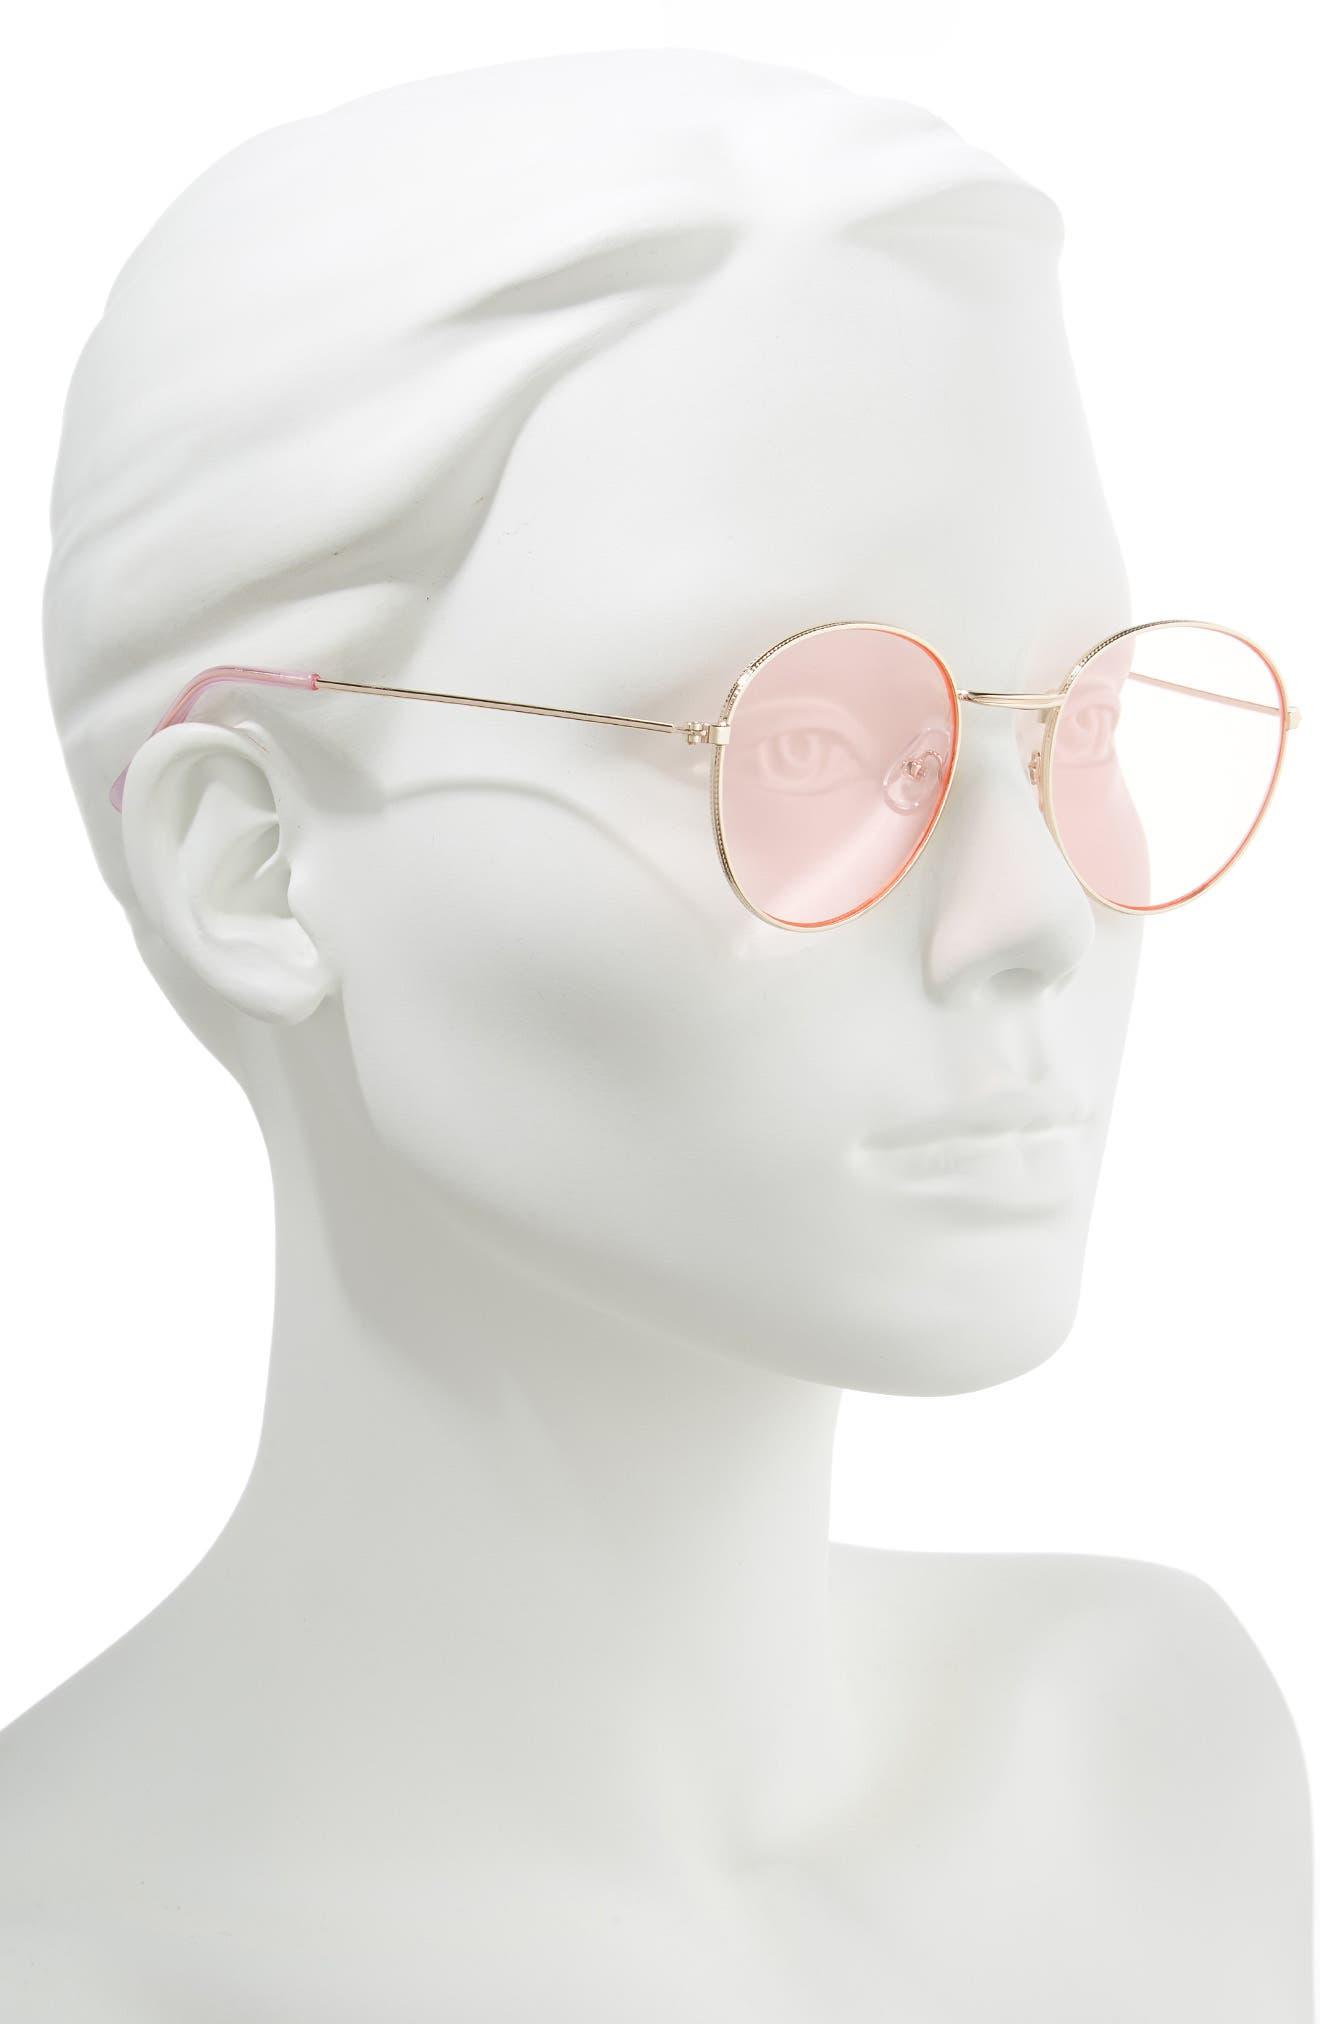 GLANCE EYEWEAR,                             50mm Thin Metal Round Sunglasses,                             Alternate thumbnail 2, color,                             GOLD/ PINK